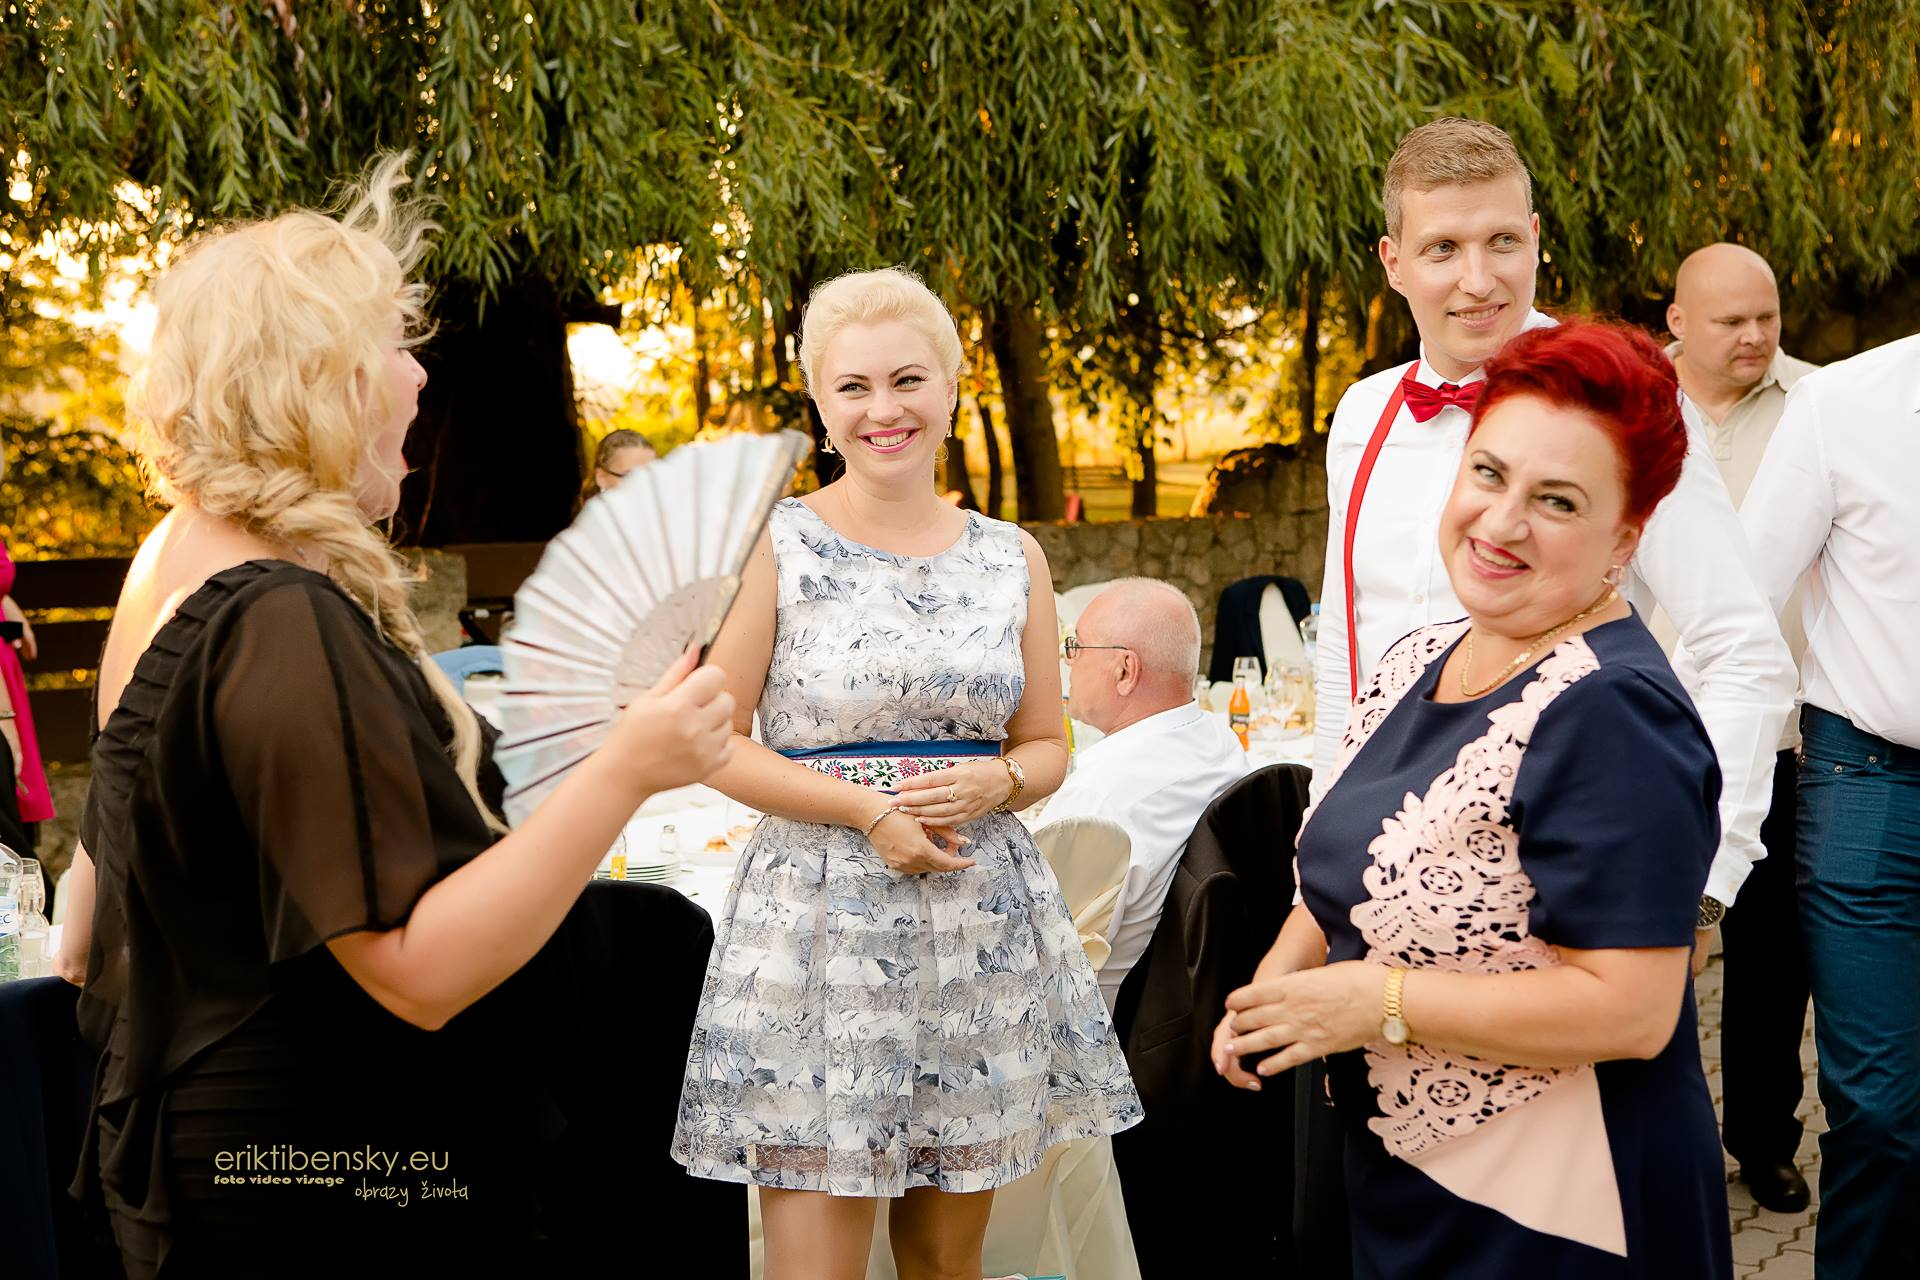 eriktibensky-eu-svadobny-fotograf-wedding-photographer-3046